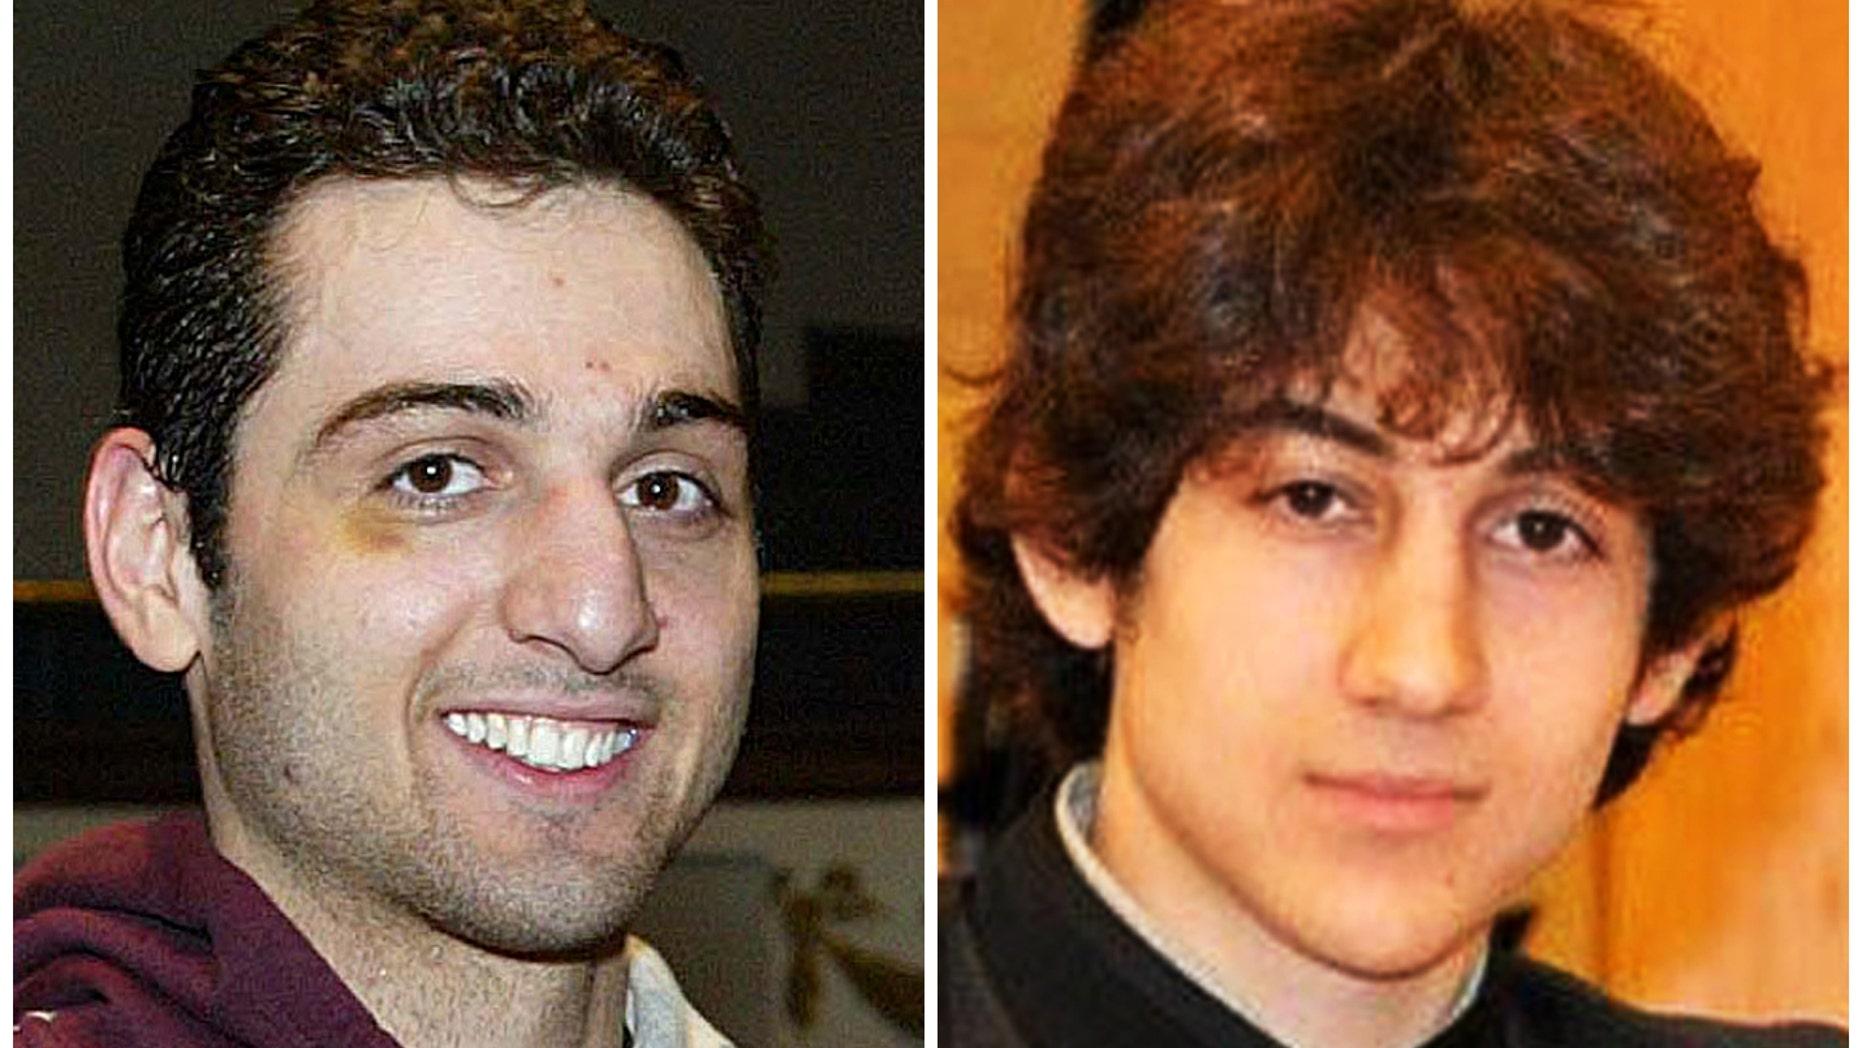 This composite of undated file photos shows Boston Marathon bombing suspects Tamerlan Tsarnaev, left, and Dzhokhar Tsarnaev.